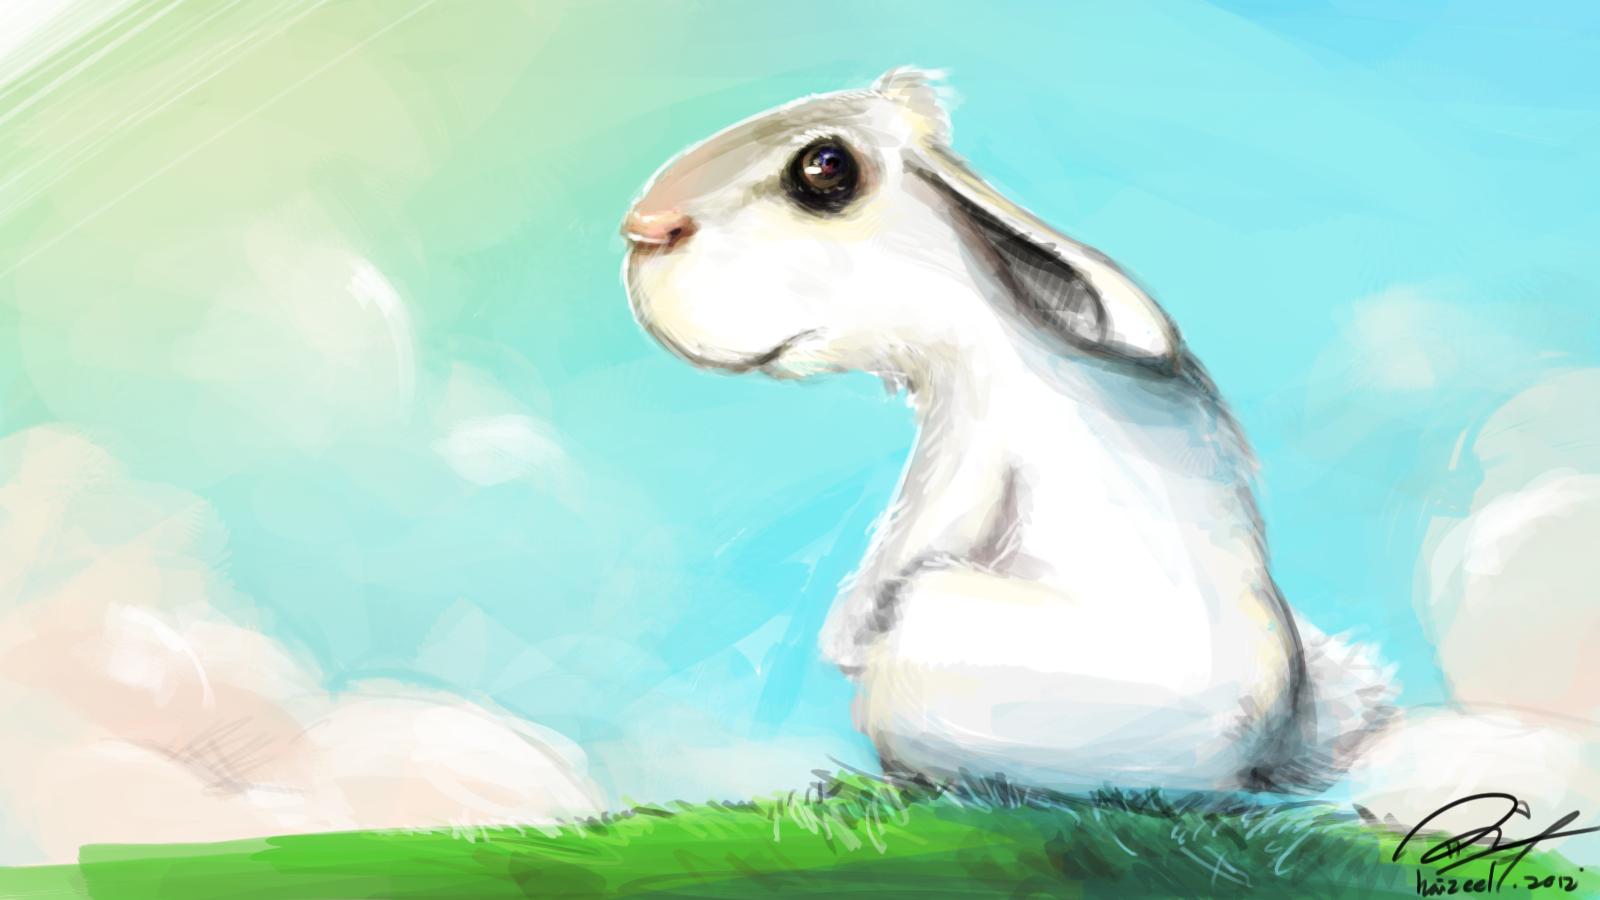 Paranoid Rabbit reaching Seren